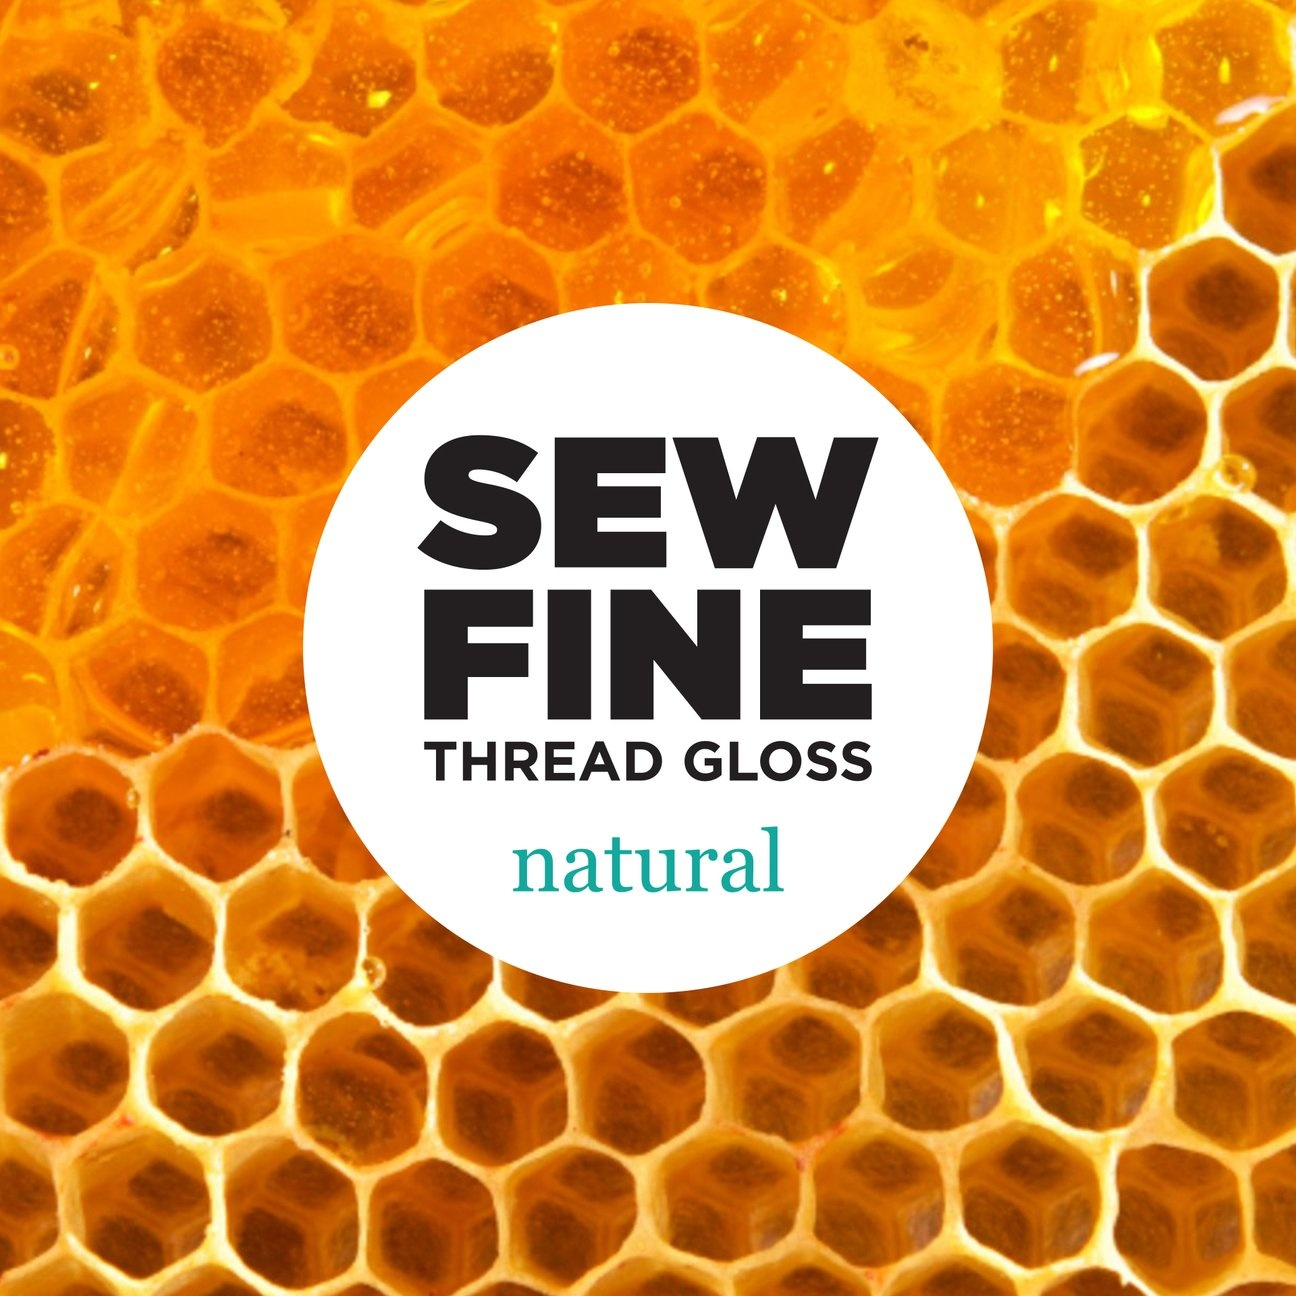 Sew Fine Thread Gloss : Natural